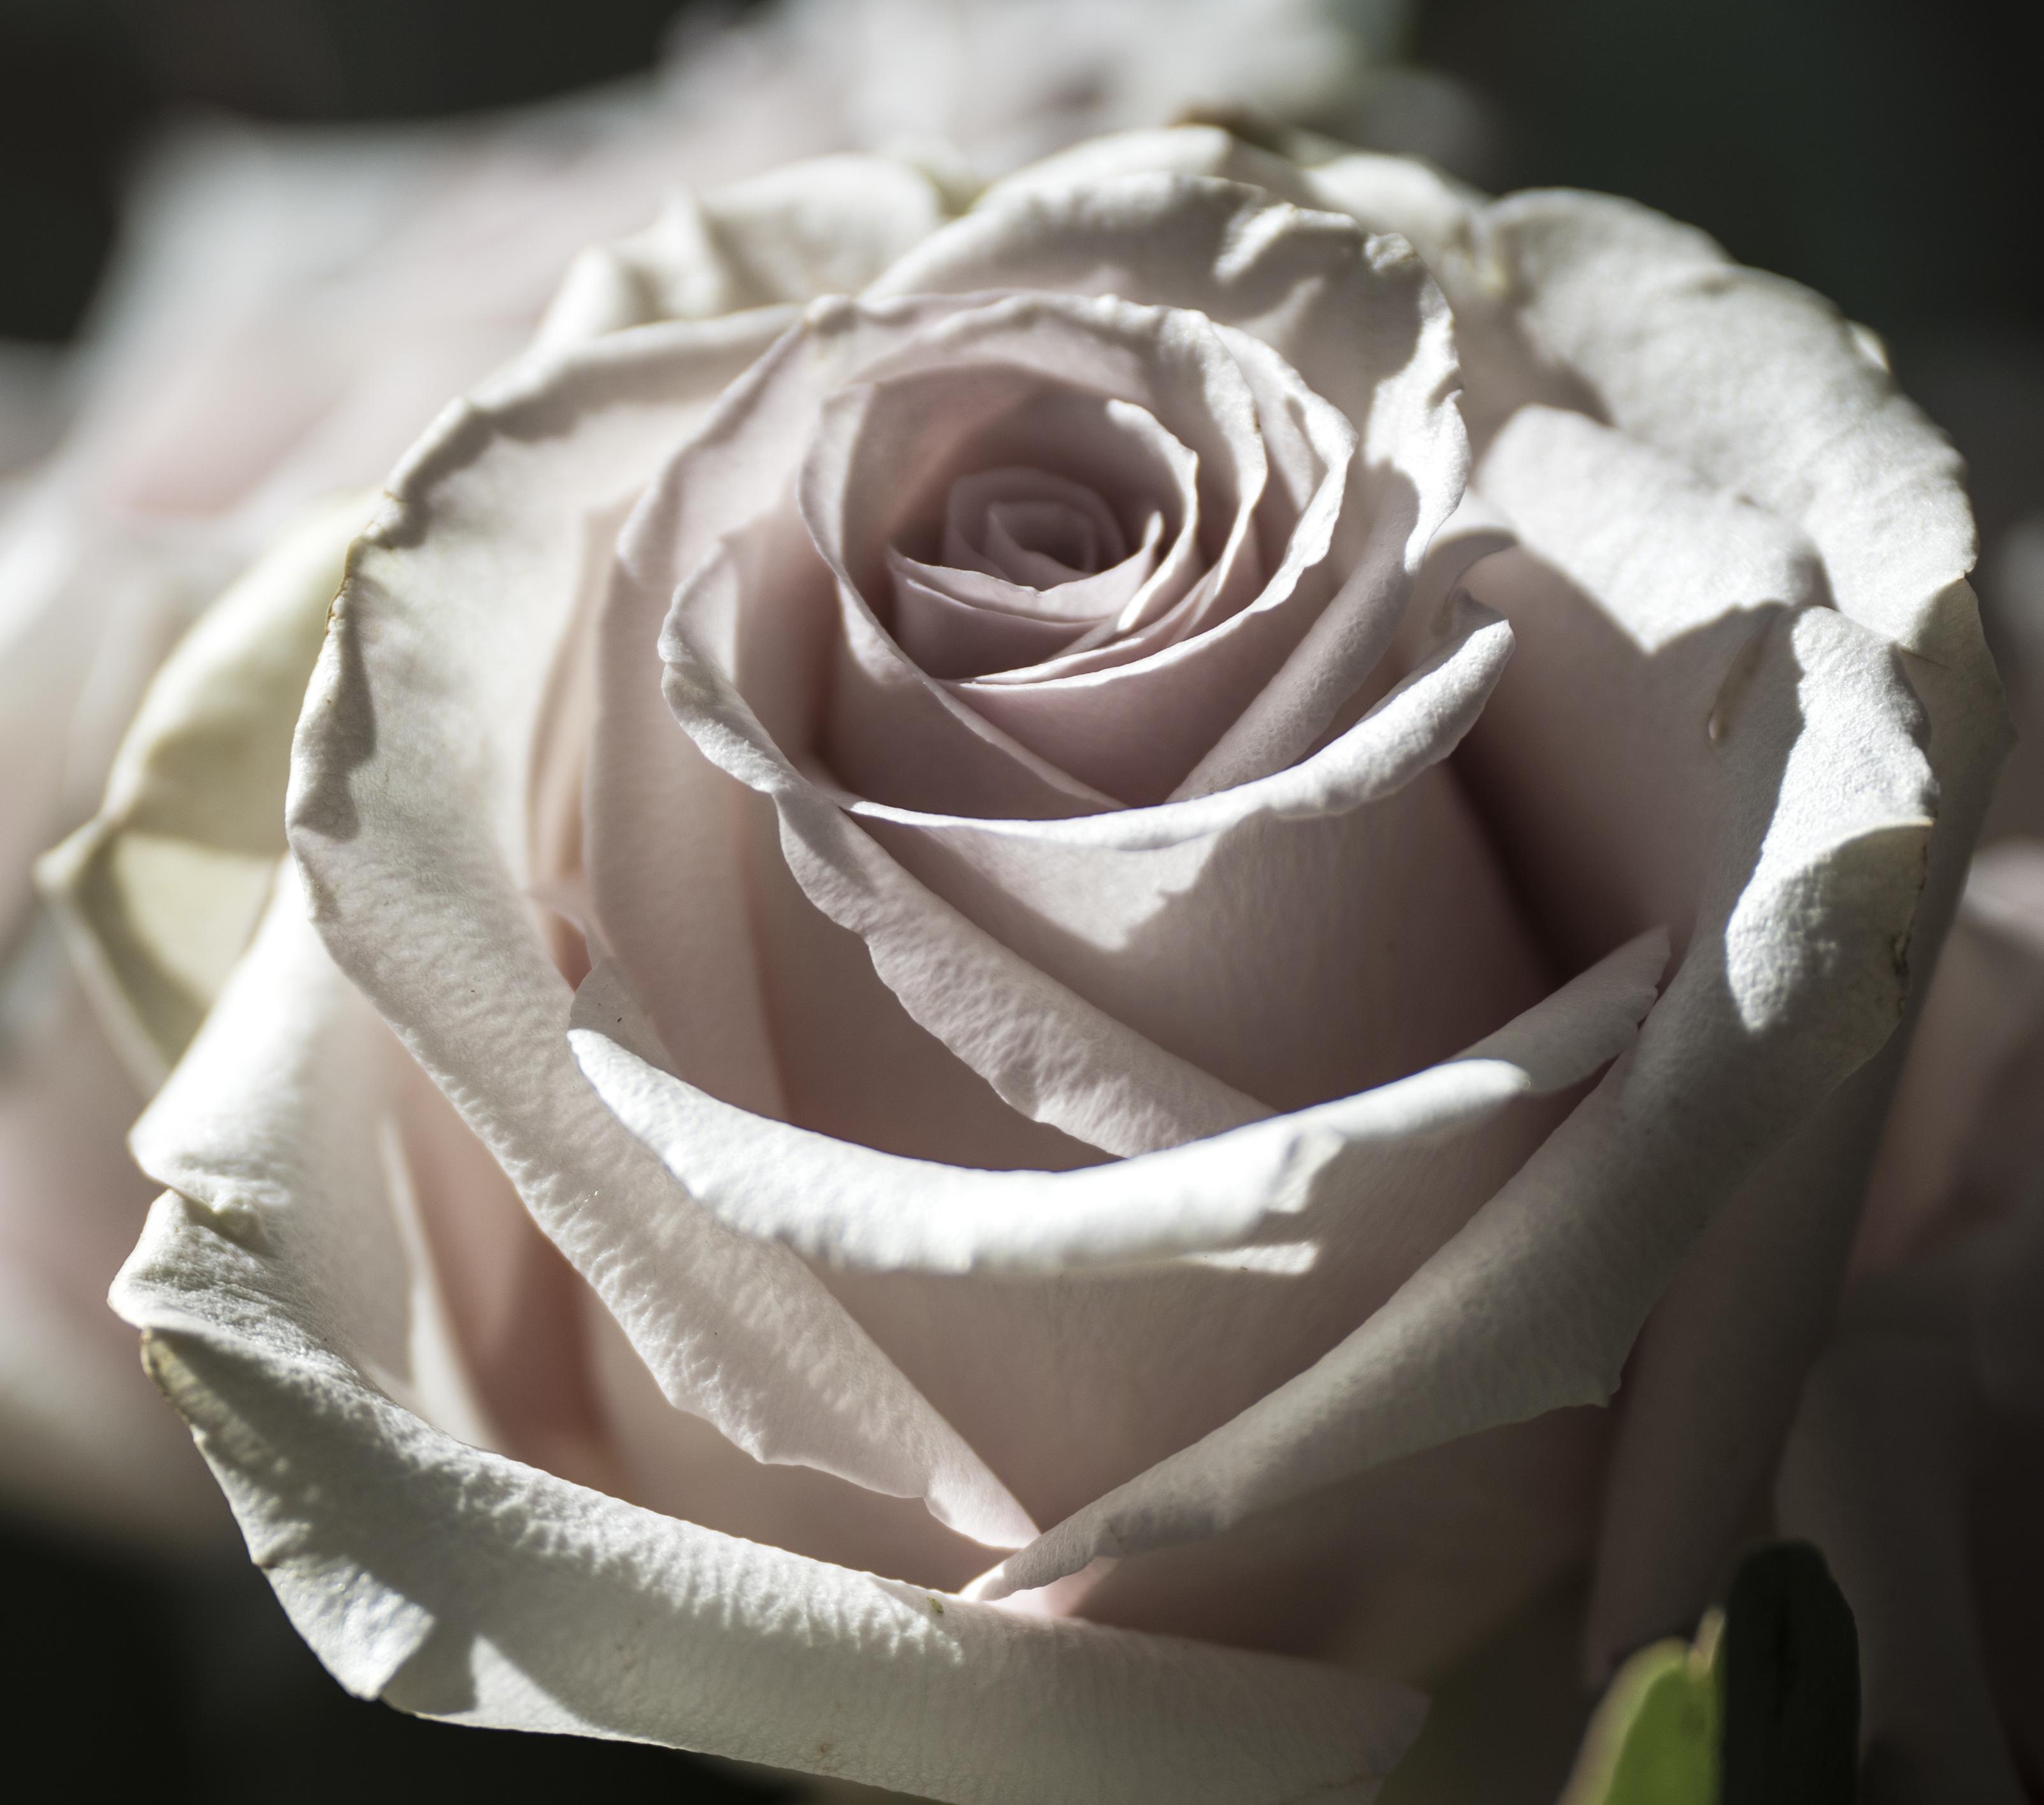 White Rose 3 copy